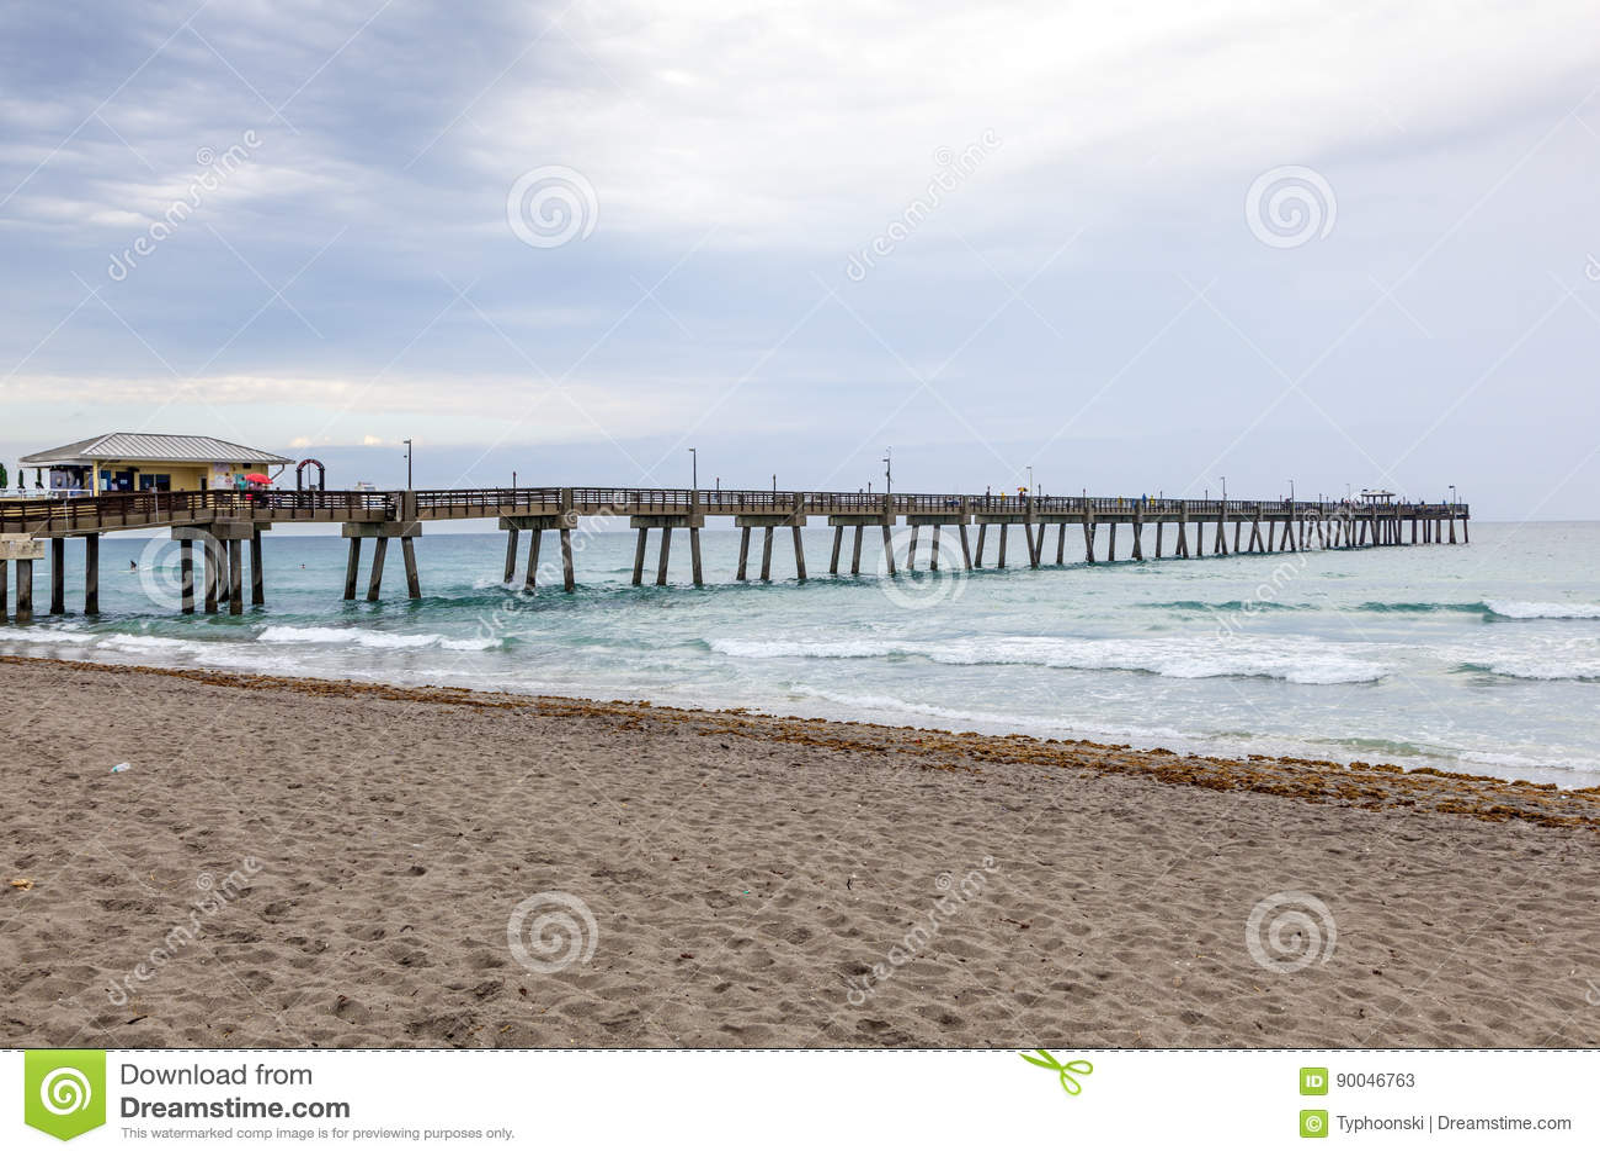 Dania Beach Fishing Pier Florida Stock Image Image Of Twilight